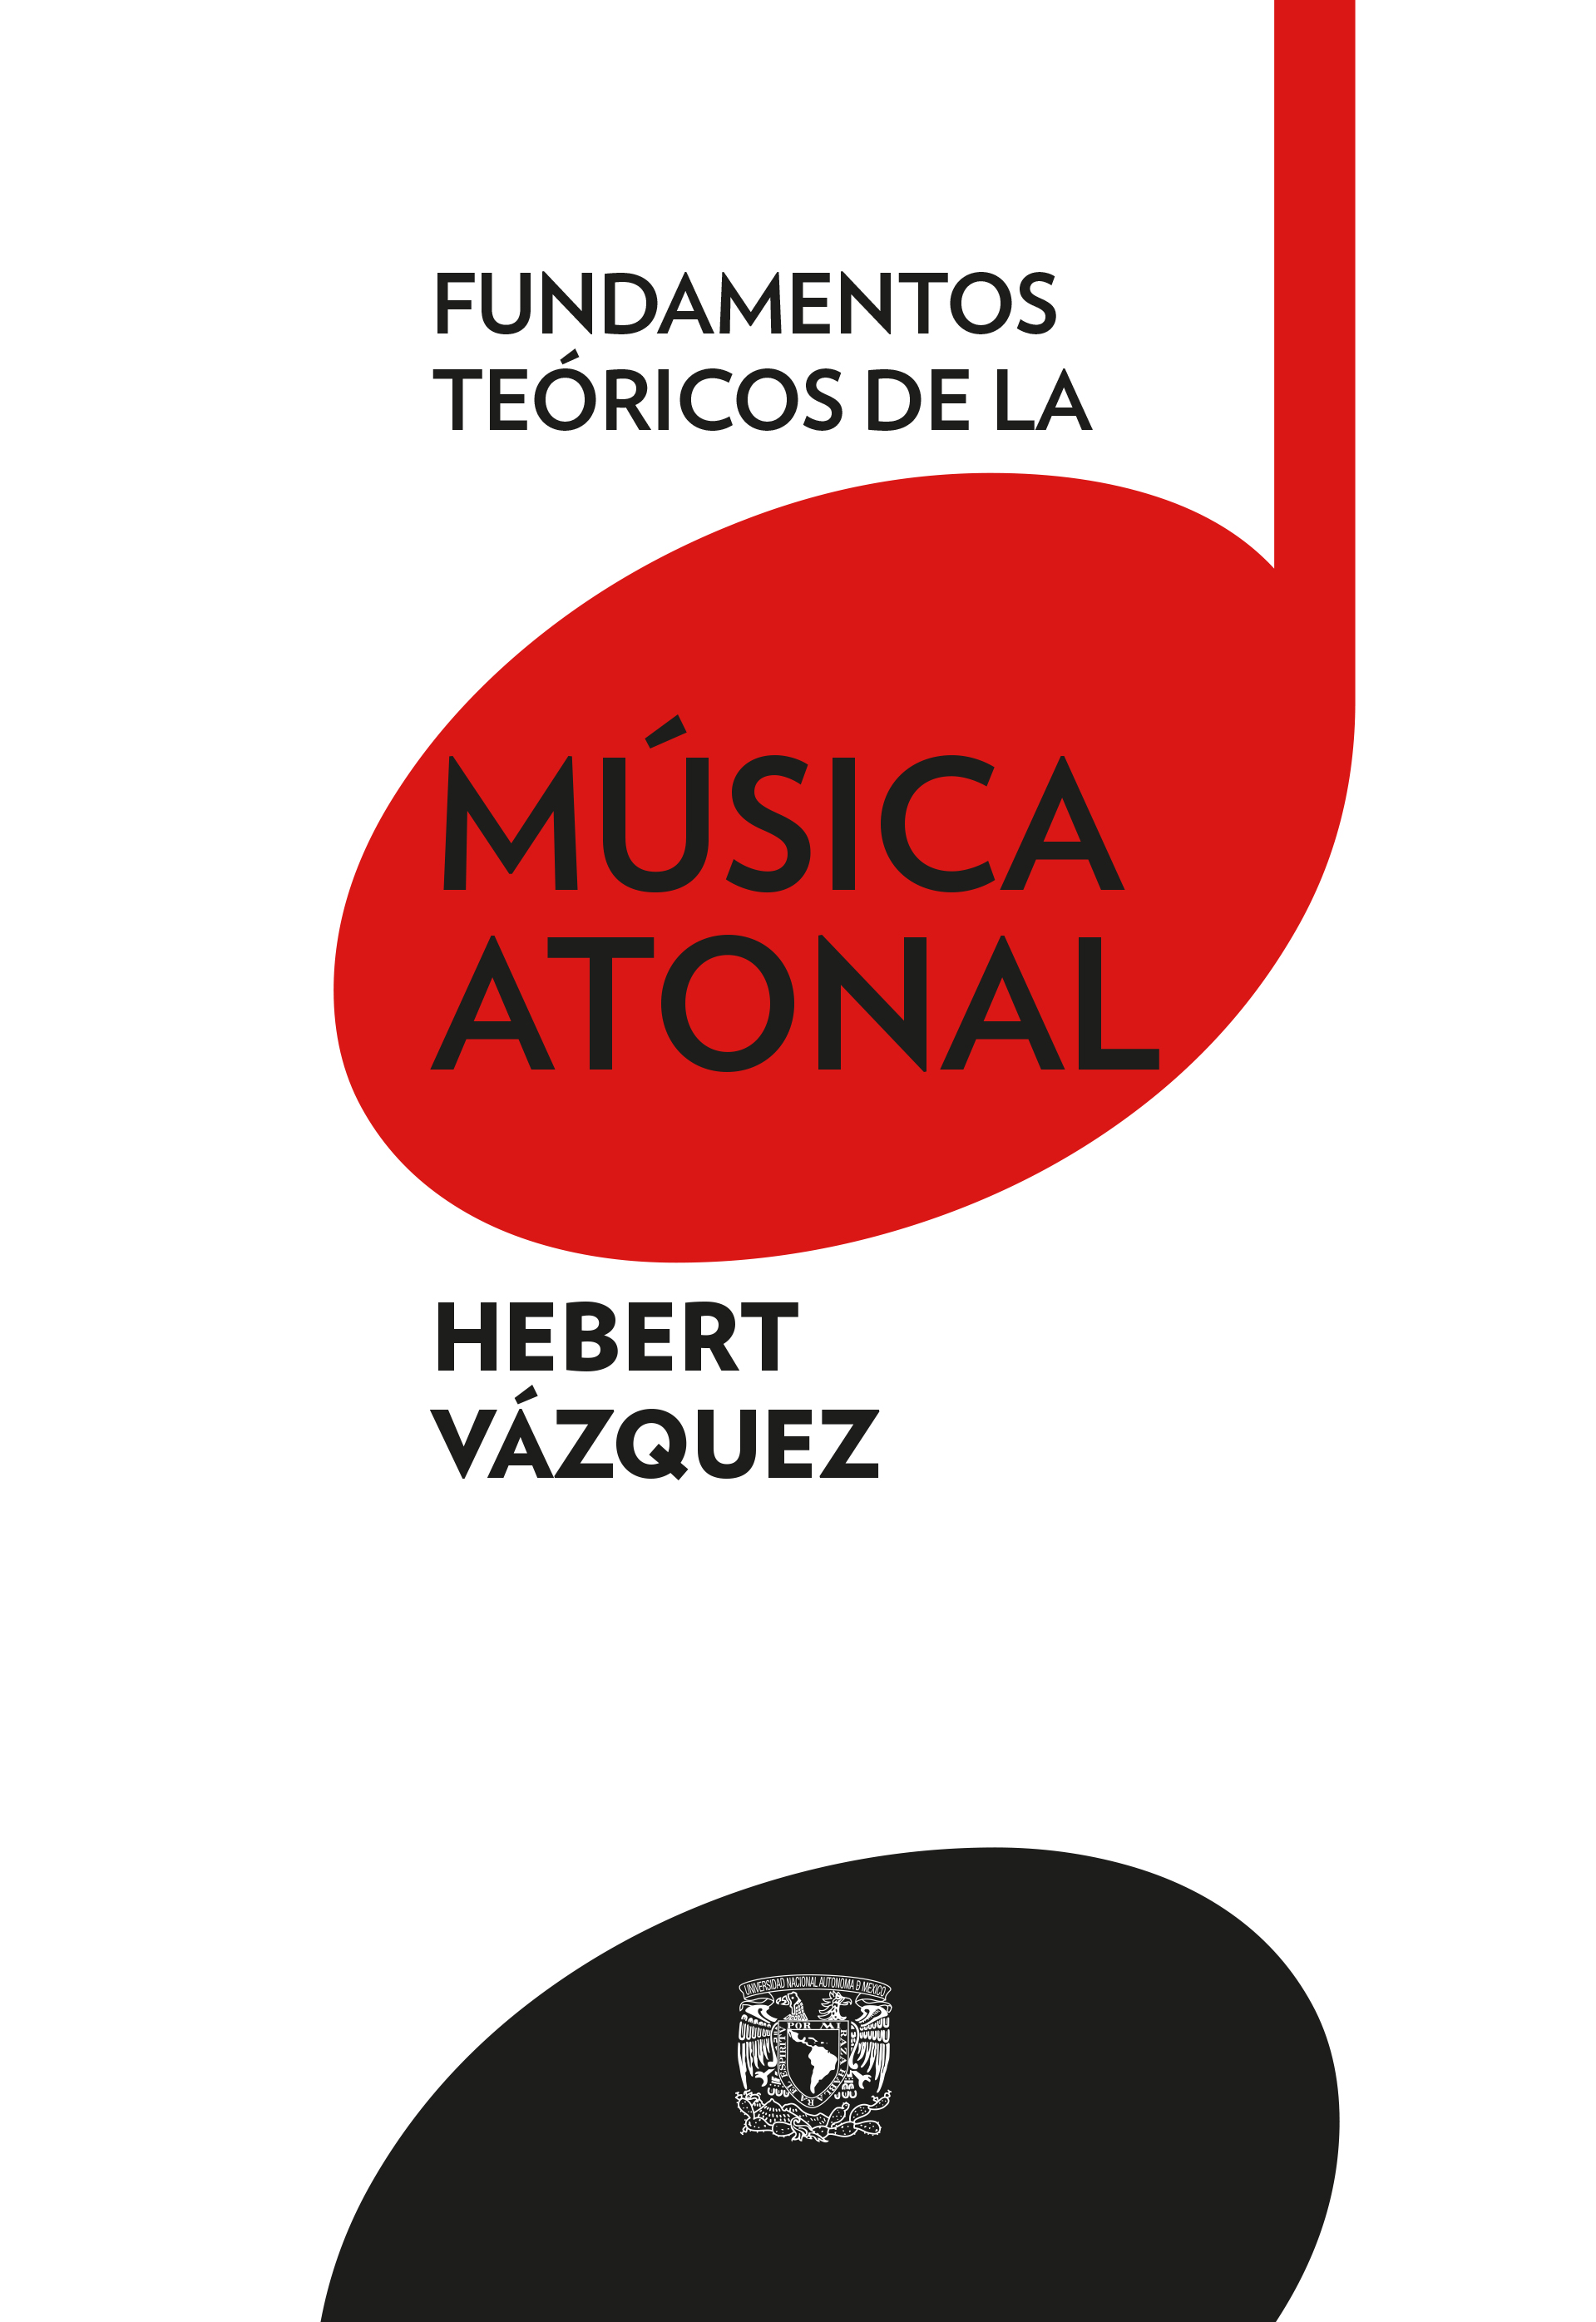 Fundamentos teóricos de la música atonal